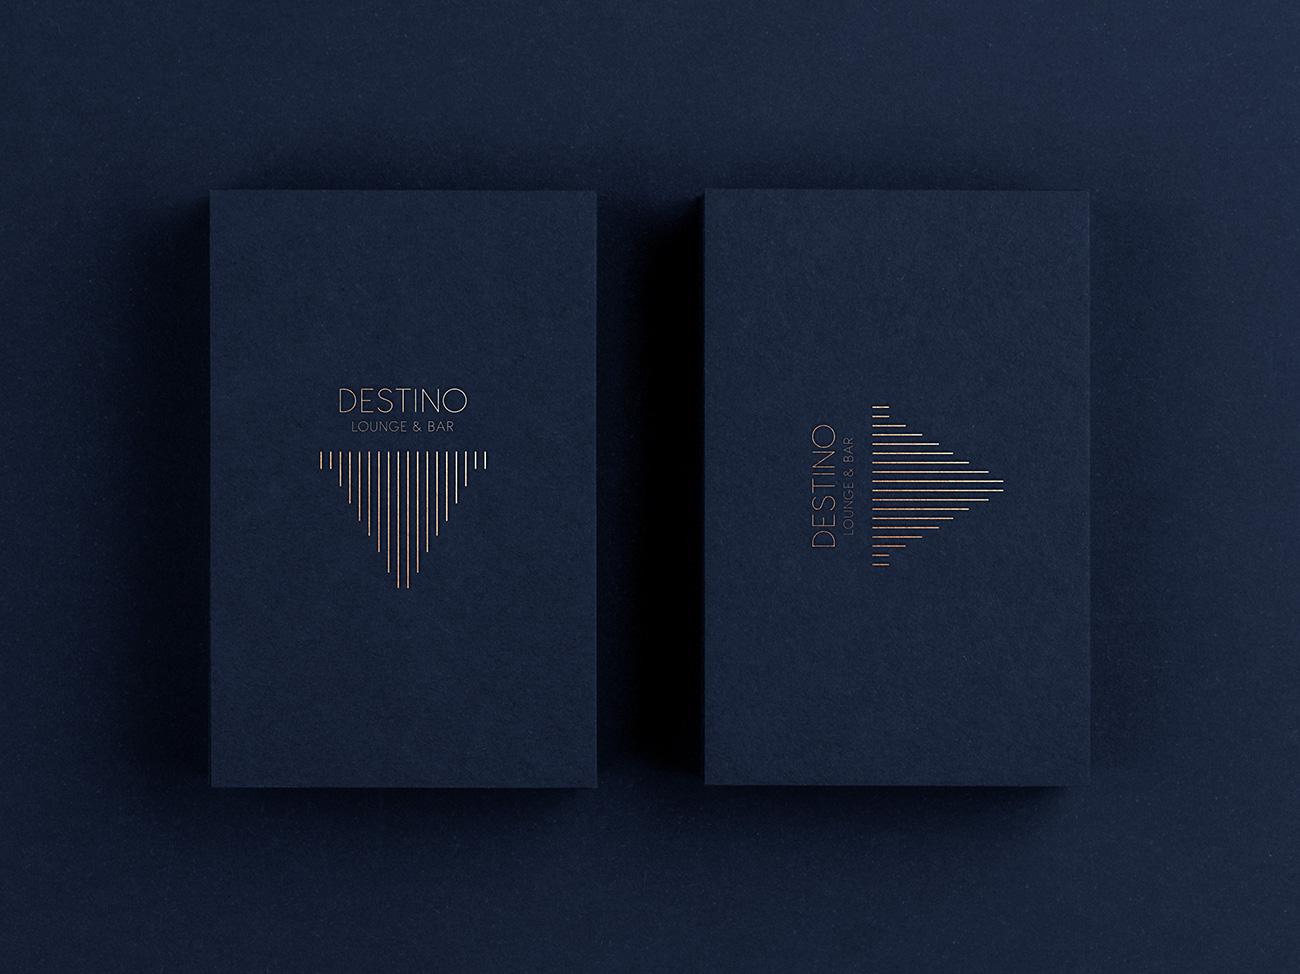 Destino-Gold-Foil-Business-Card